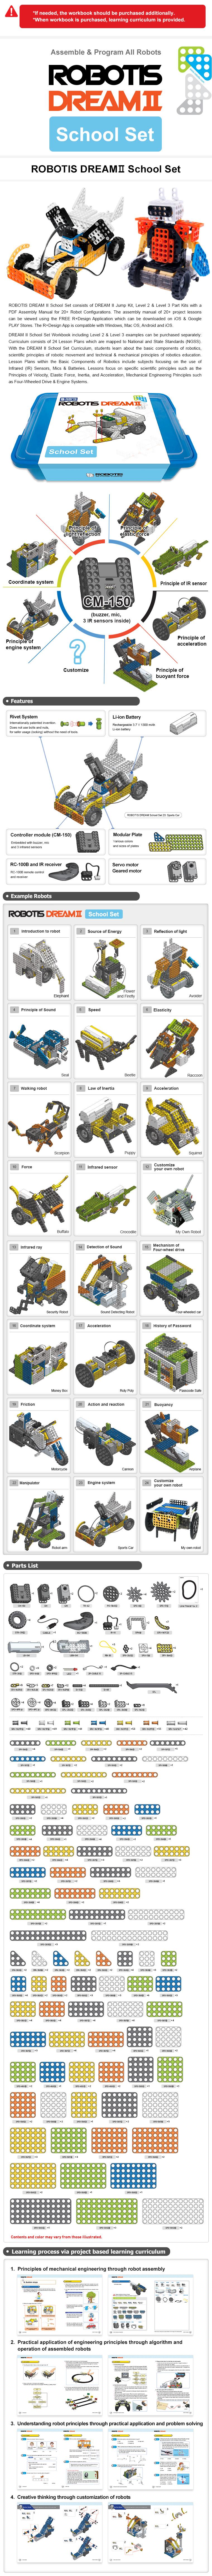 ROBOTIS DREAM2 School Set